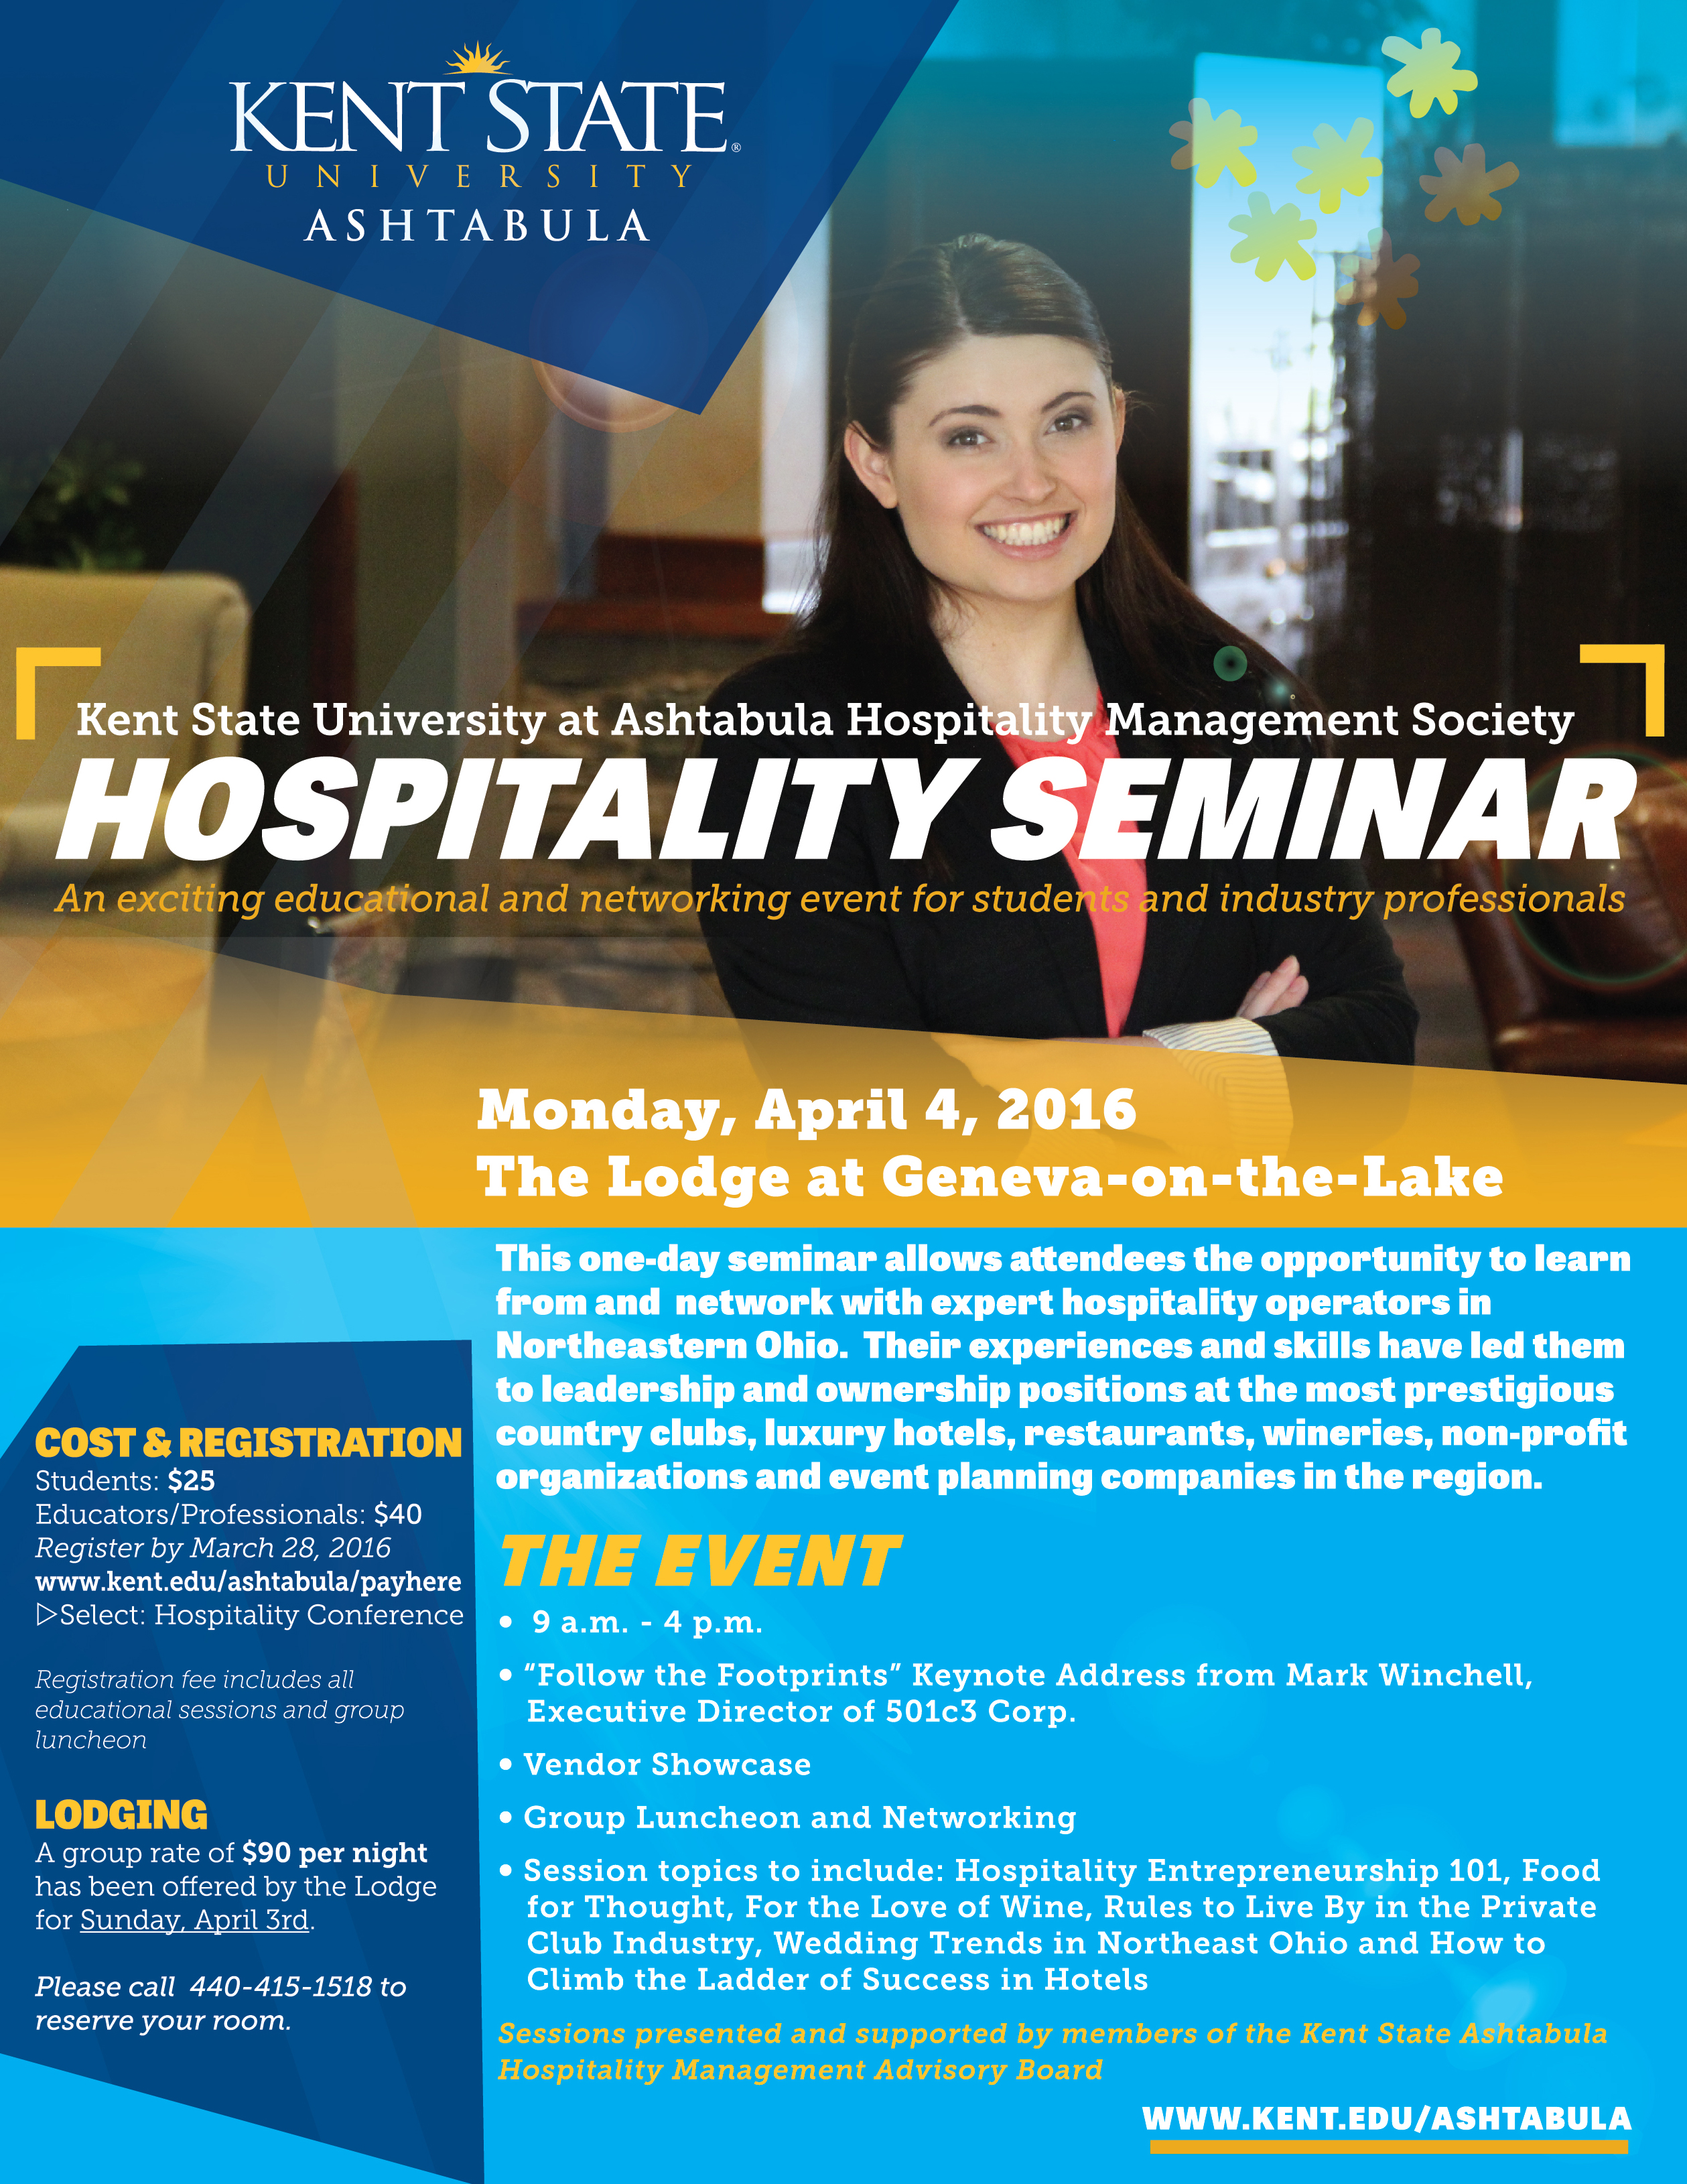 Kent State Ashtabula Hospitality Seminar 2016 Flyer